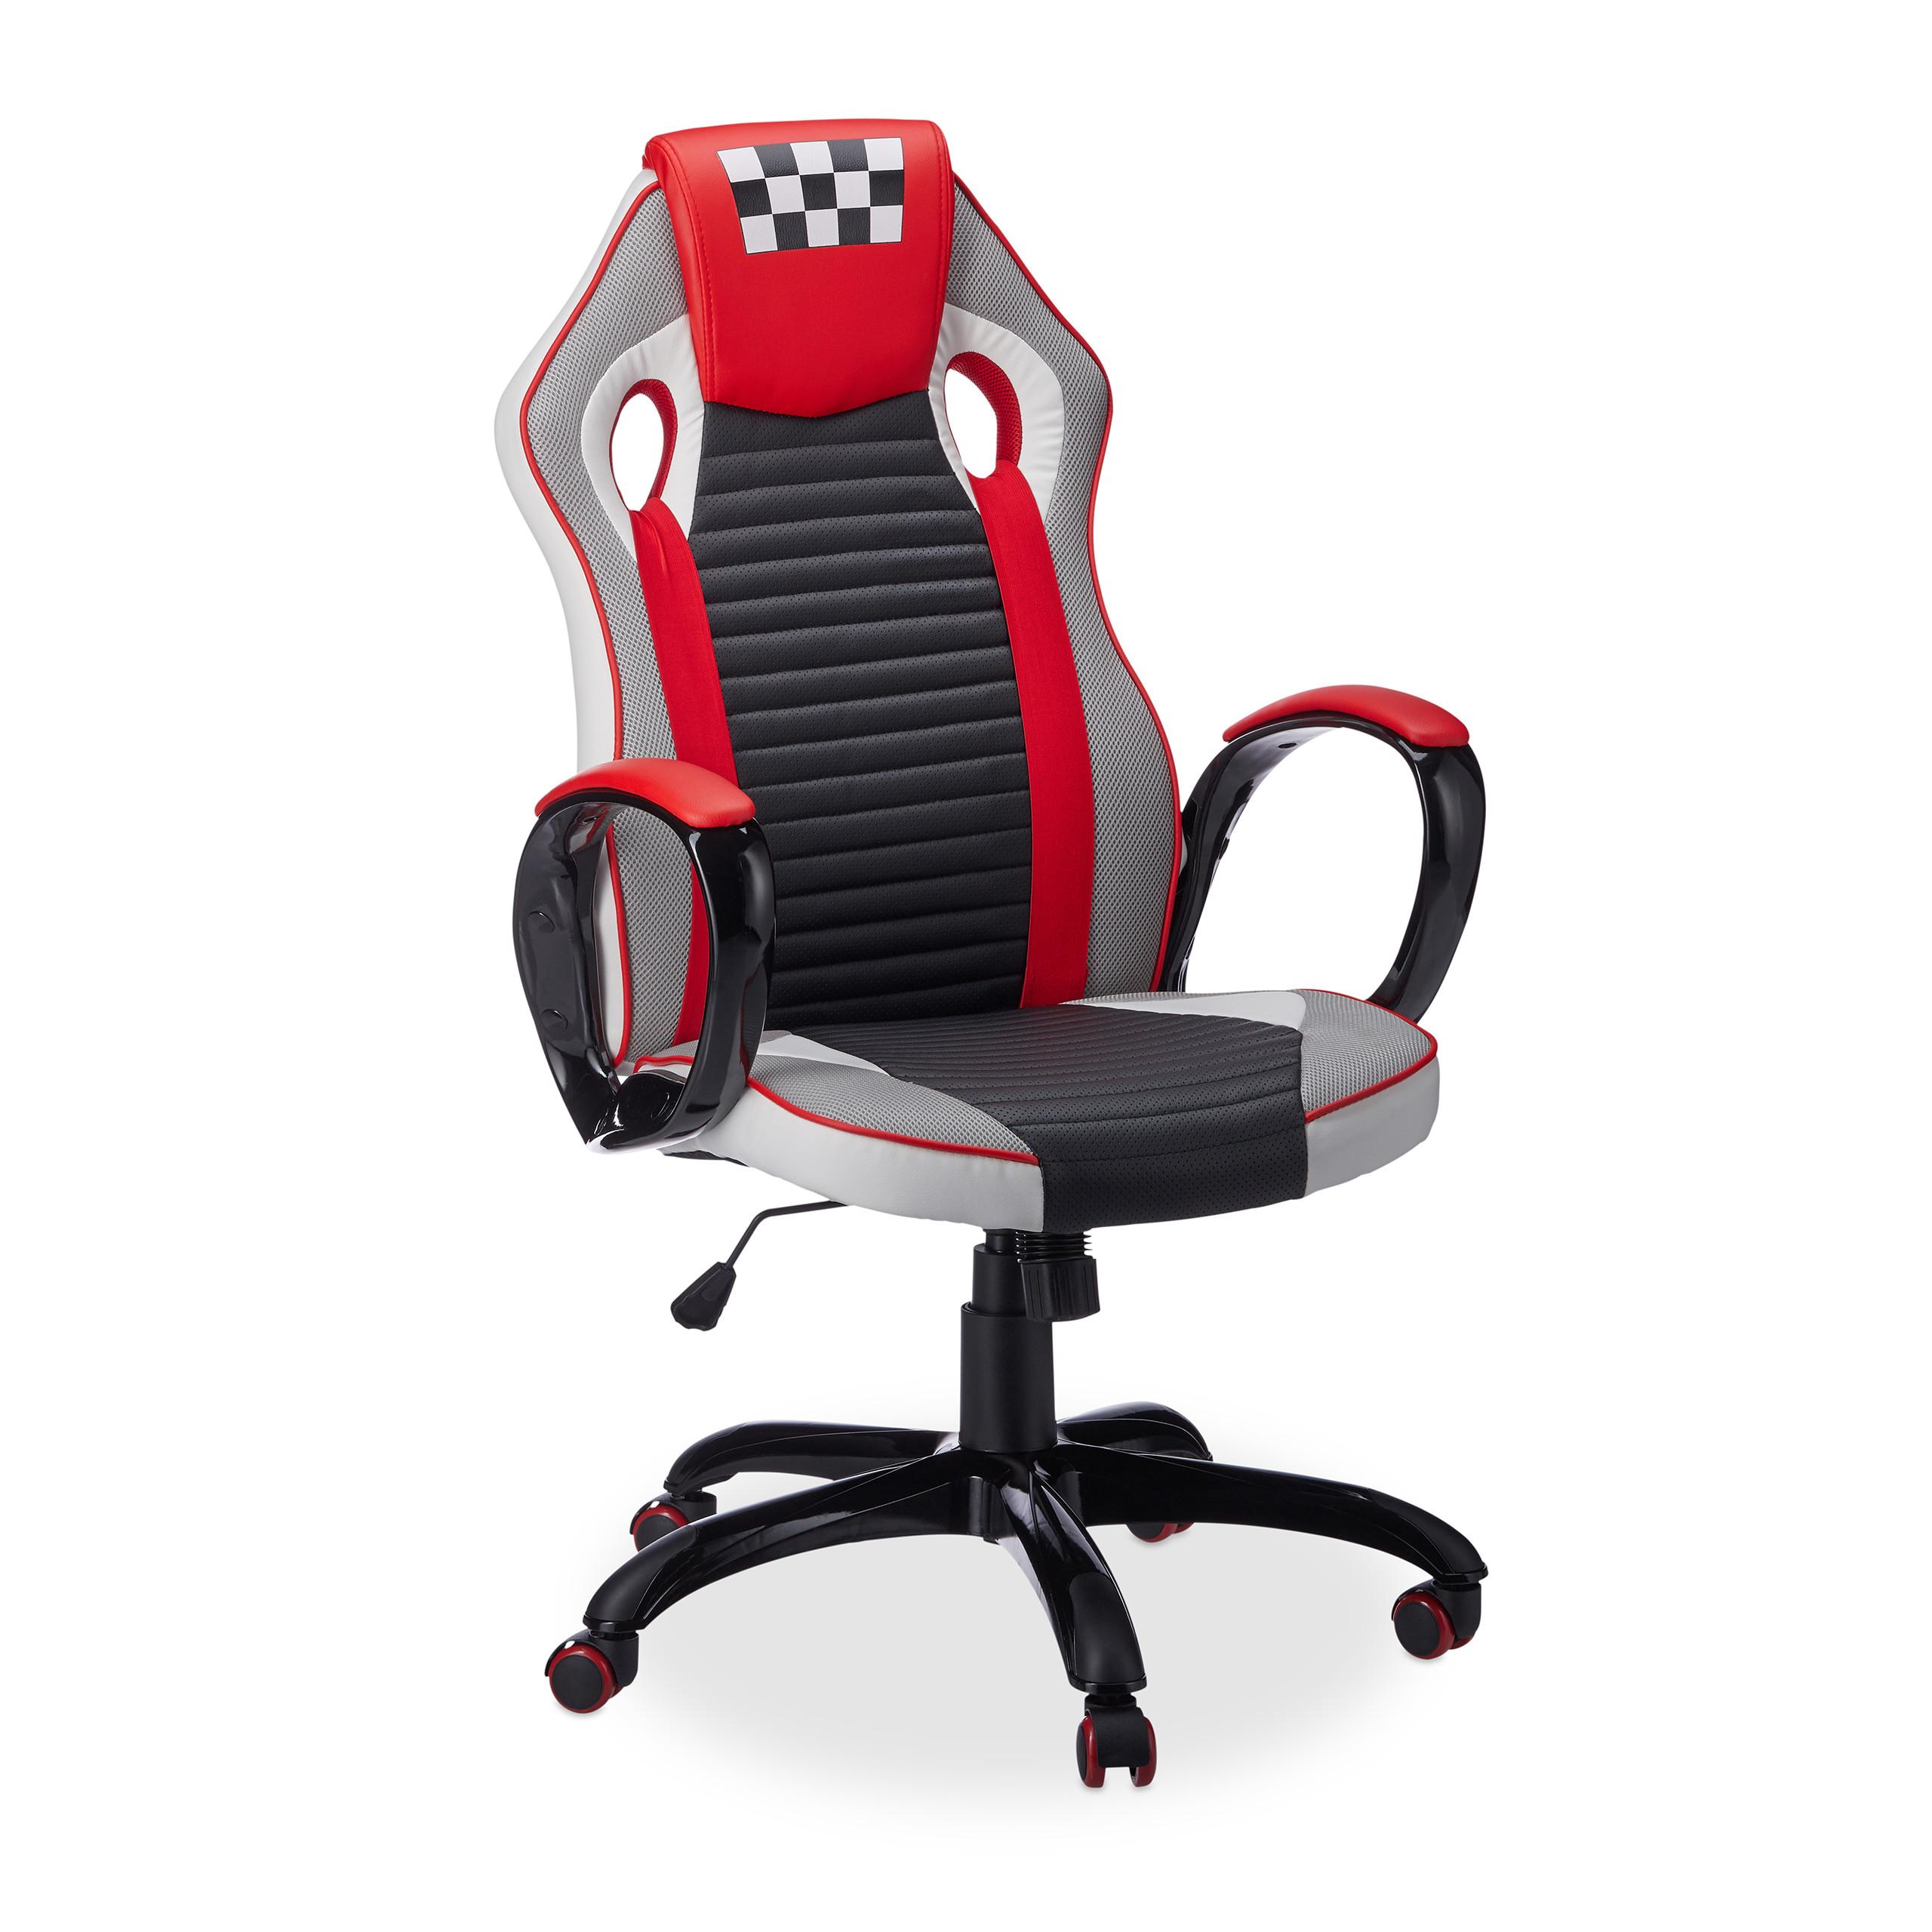 Schreibtischstuhl Sportsitz Bürostuhl Gaming Stuhl XR7 Gamer Chair Drehstuhl